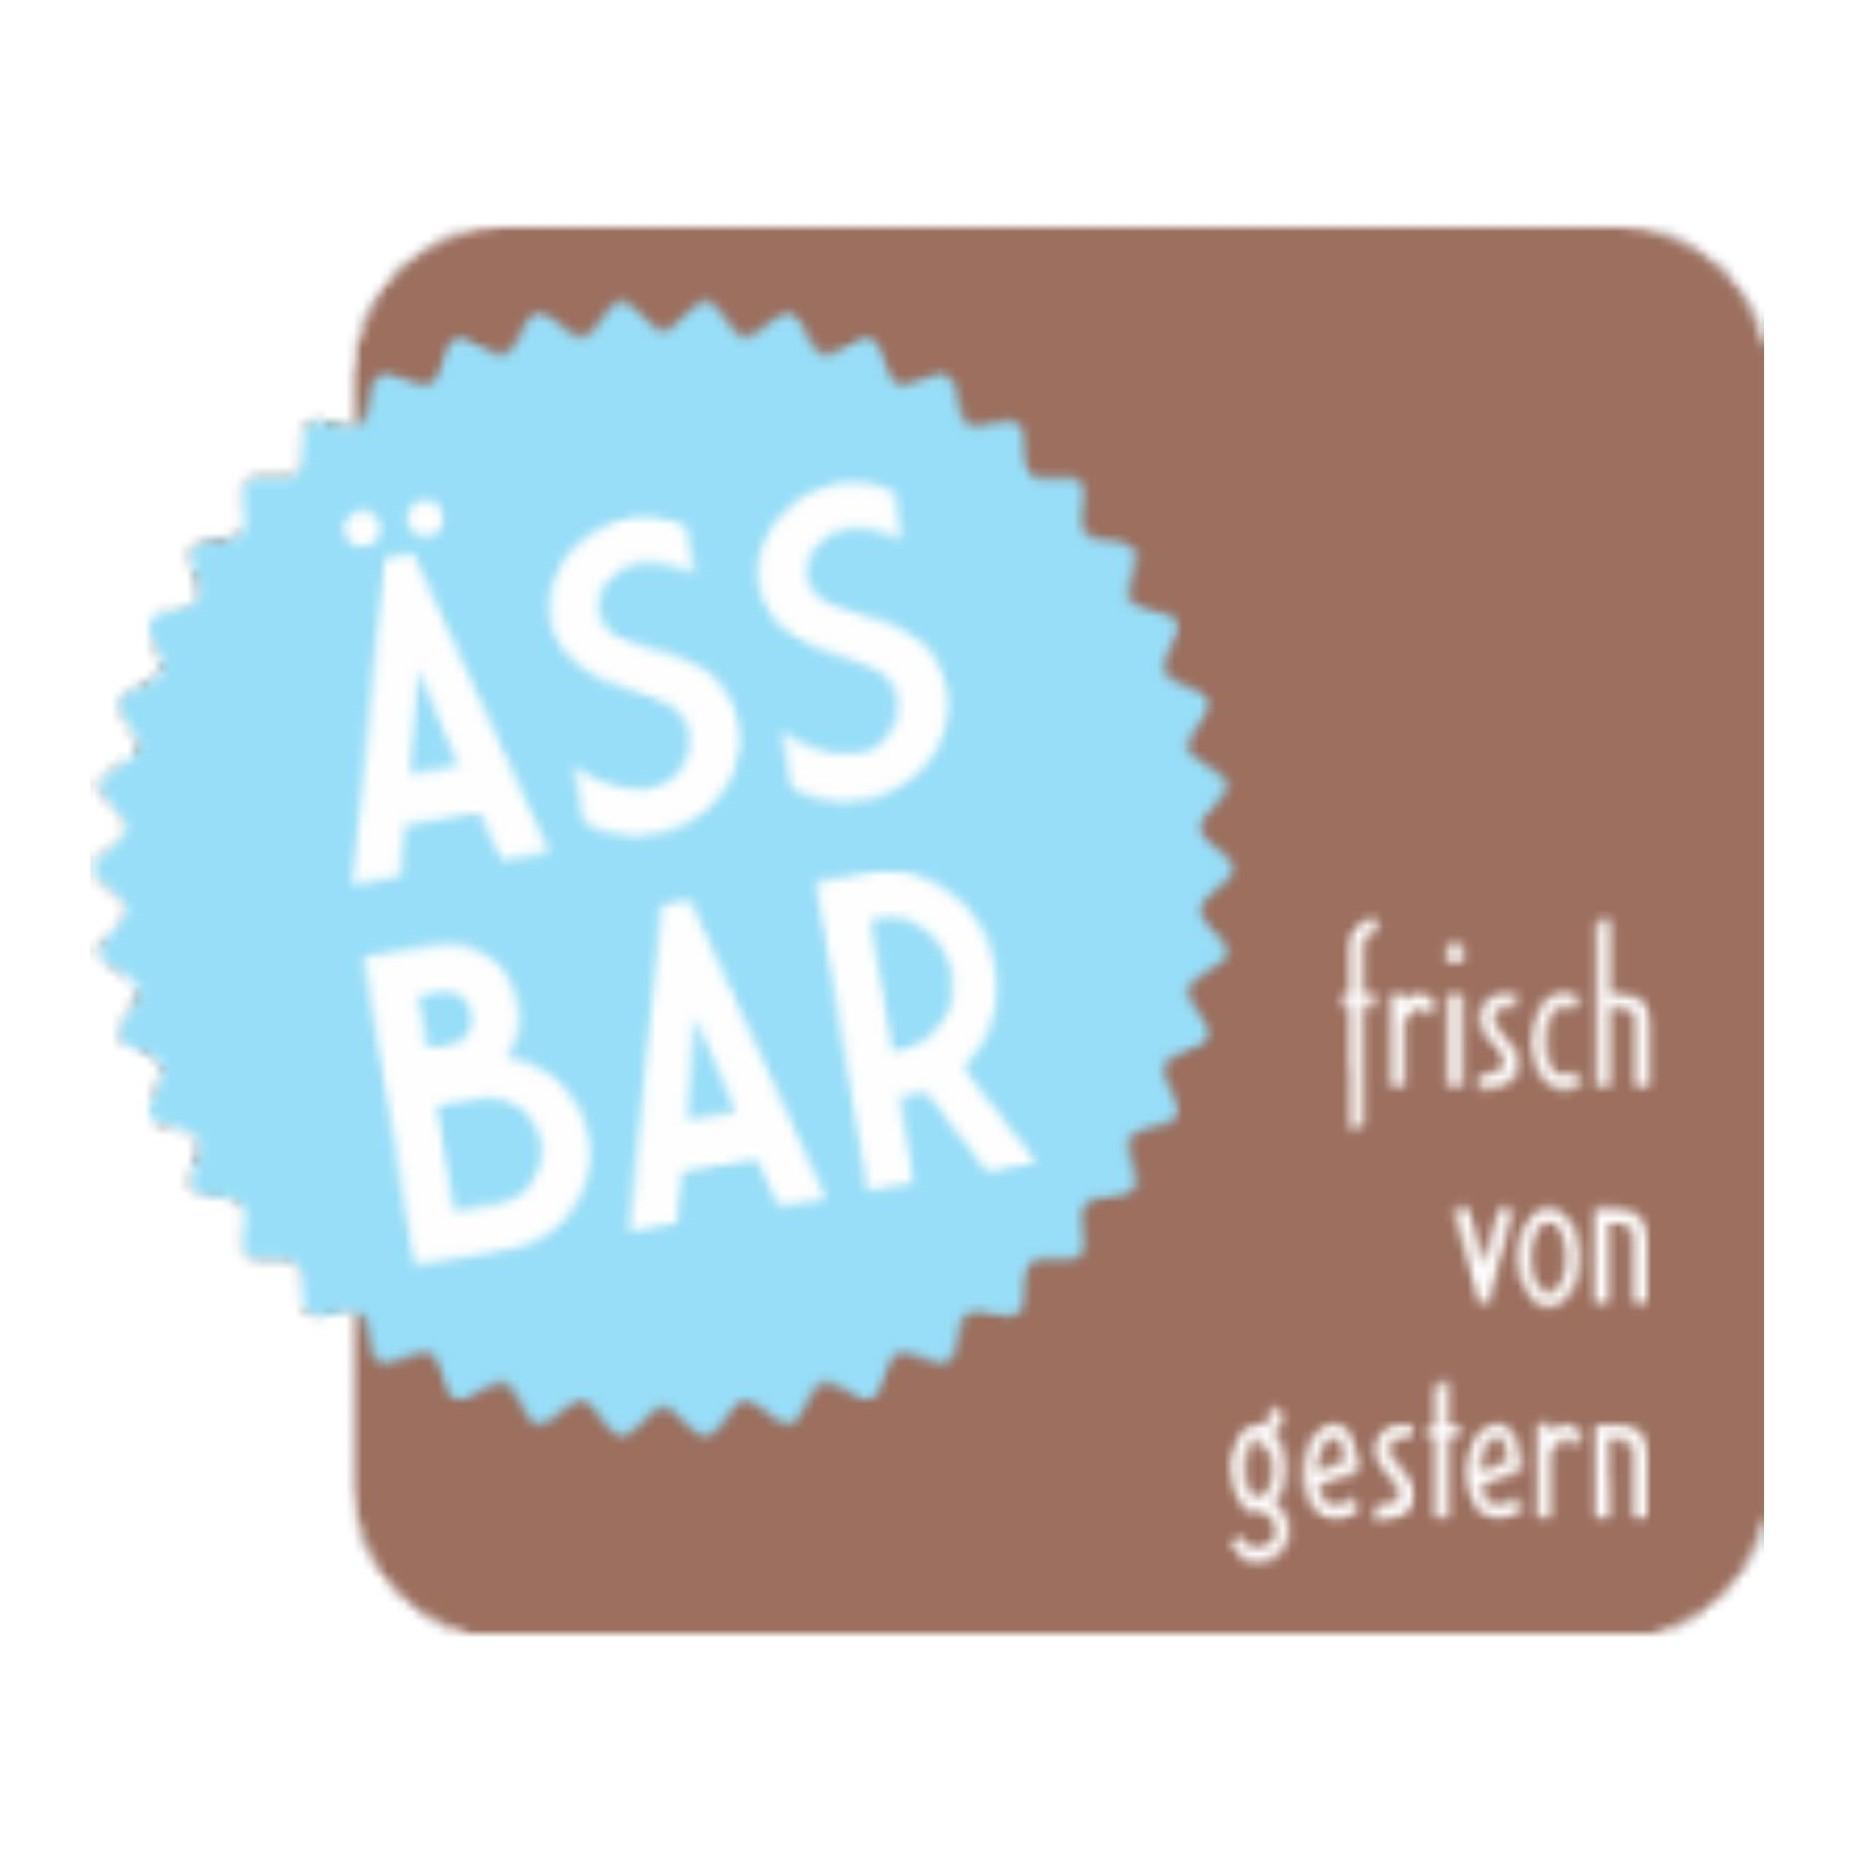 Äss-Bar Bern GmbH